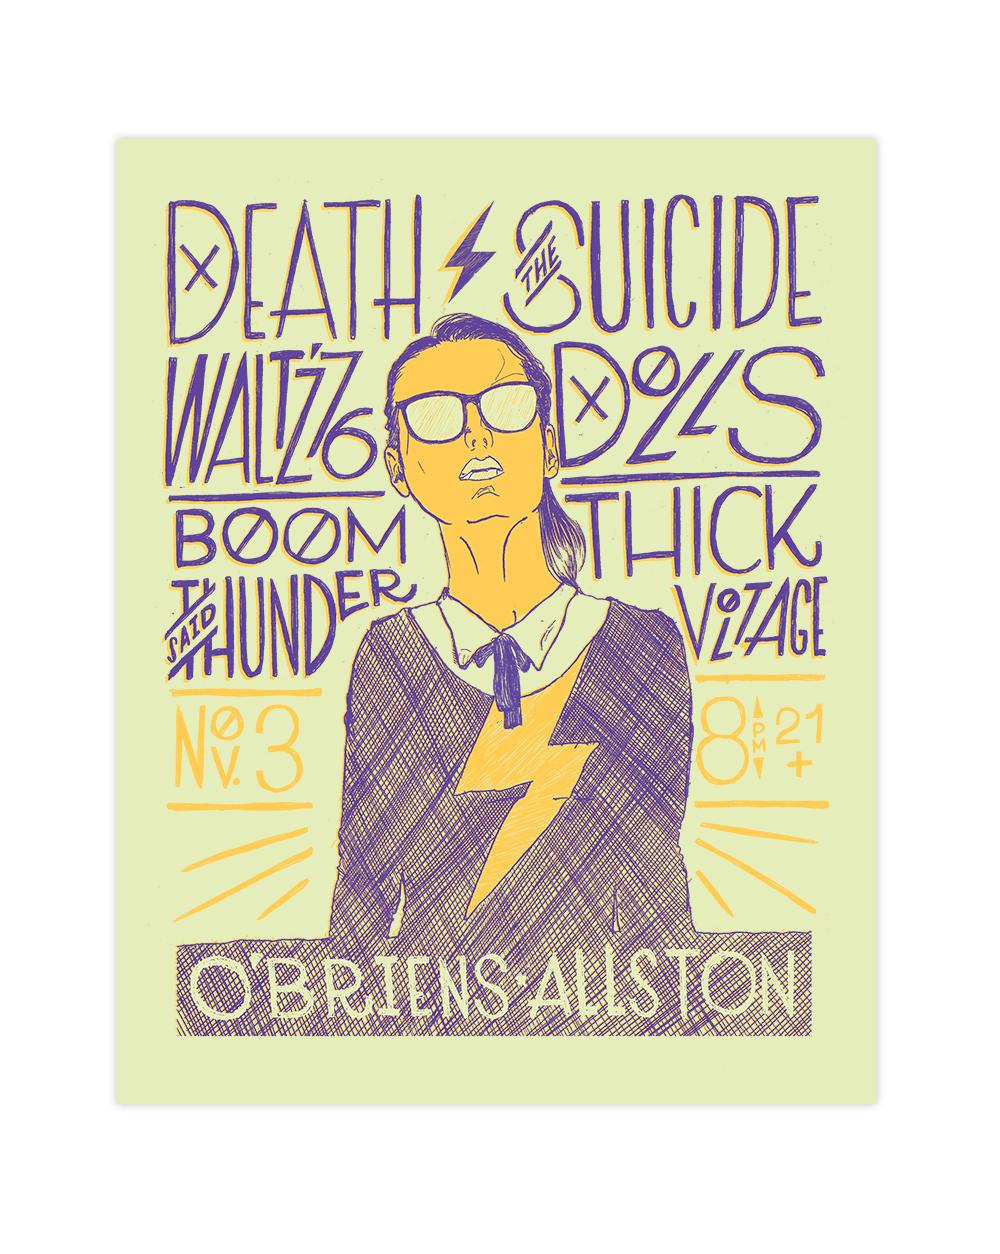 DeathWaltz Poster copy.png